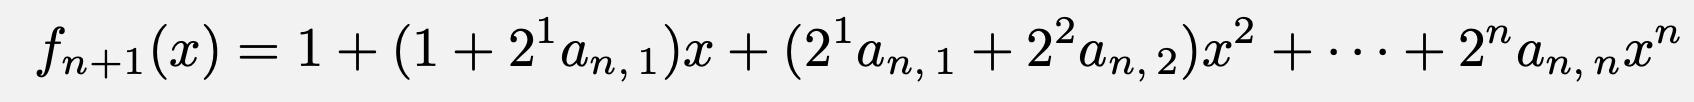 \[f_{n+1}(x)=1+(1+2^1a_{n,\,1})x+(2^1a_{n,\,1}+2^2a_{n,\,2})x^2+\cdots+2^na_{n,\,n}x^n\]